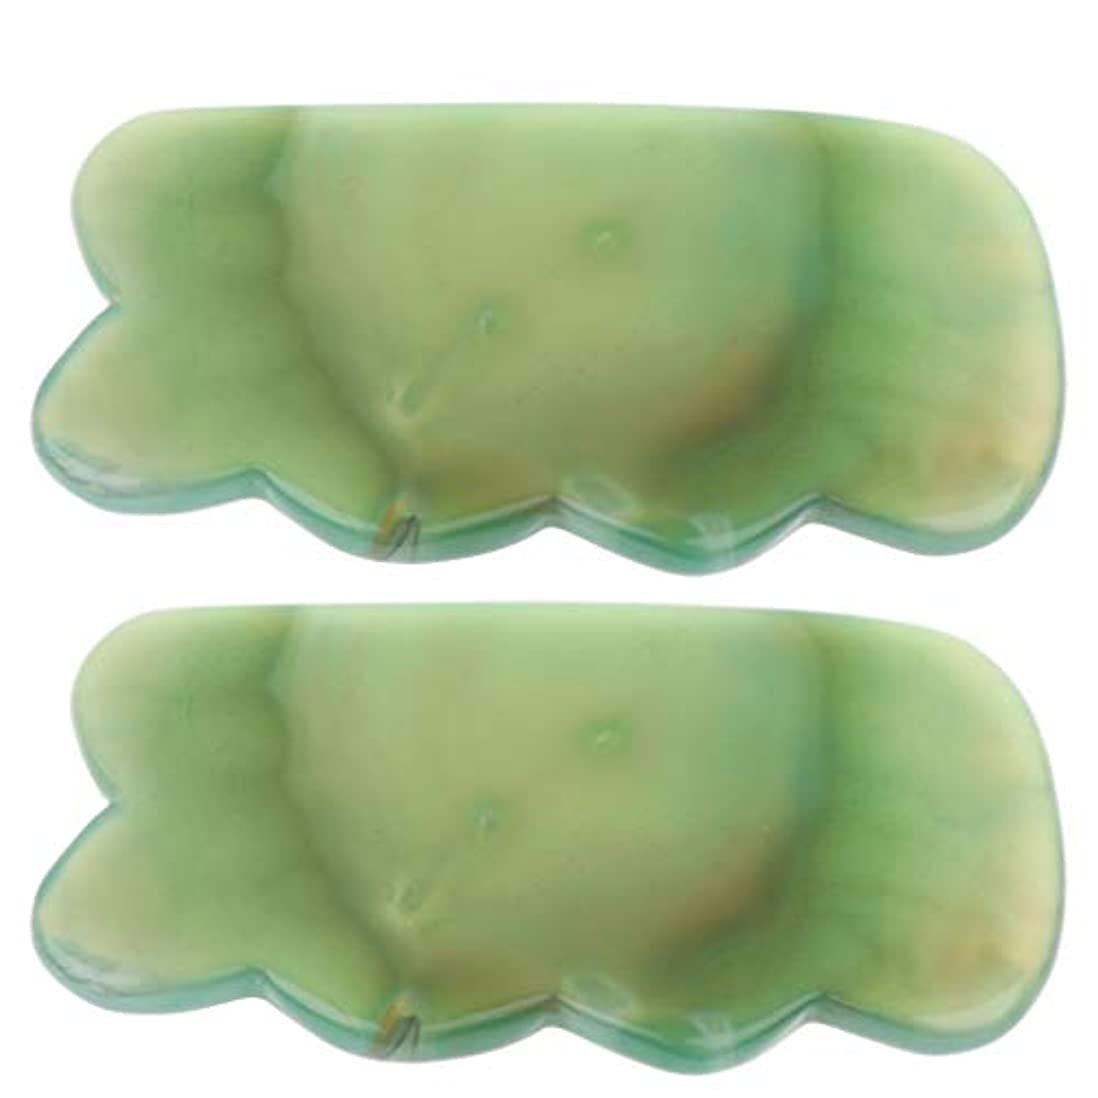 P Prettyia かっさプレート カッサ板 天然石 瑪瑙玉 カッサボード カッサマッサージ道具 スパ 2個入